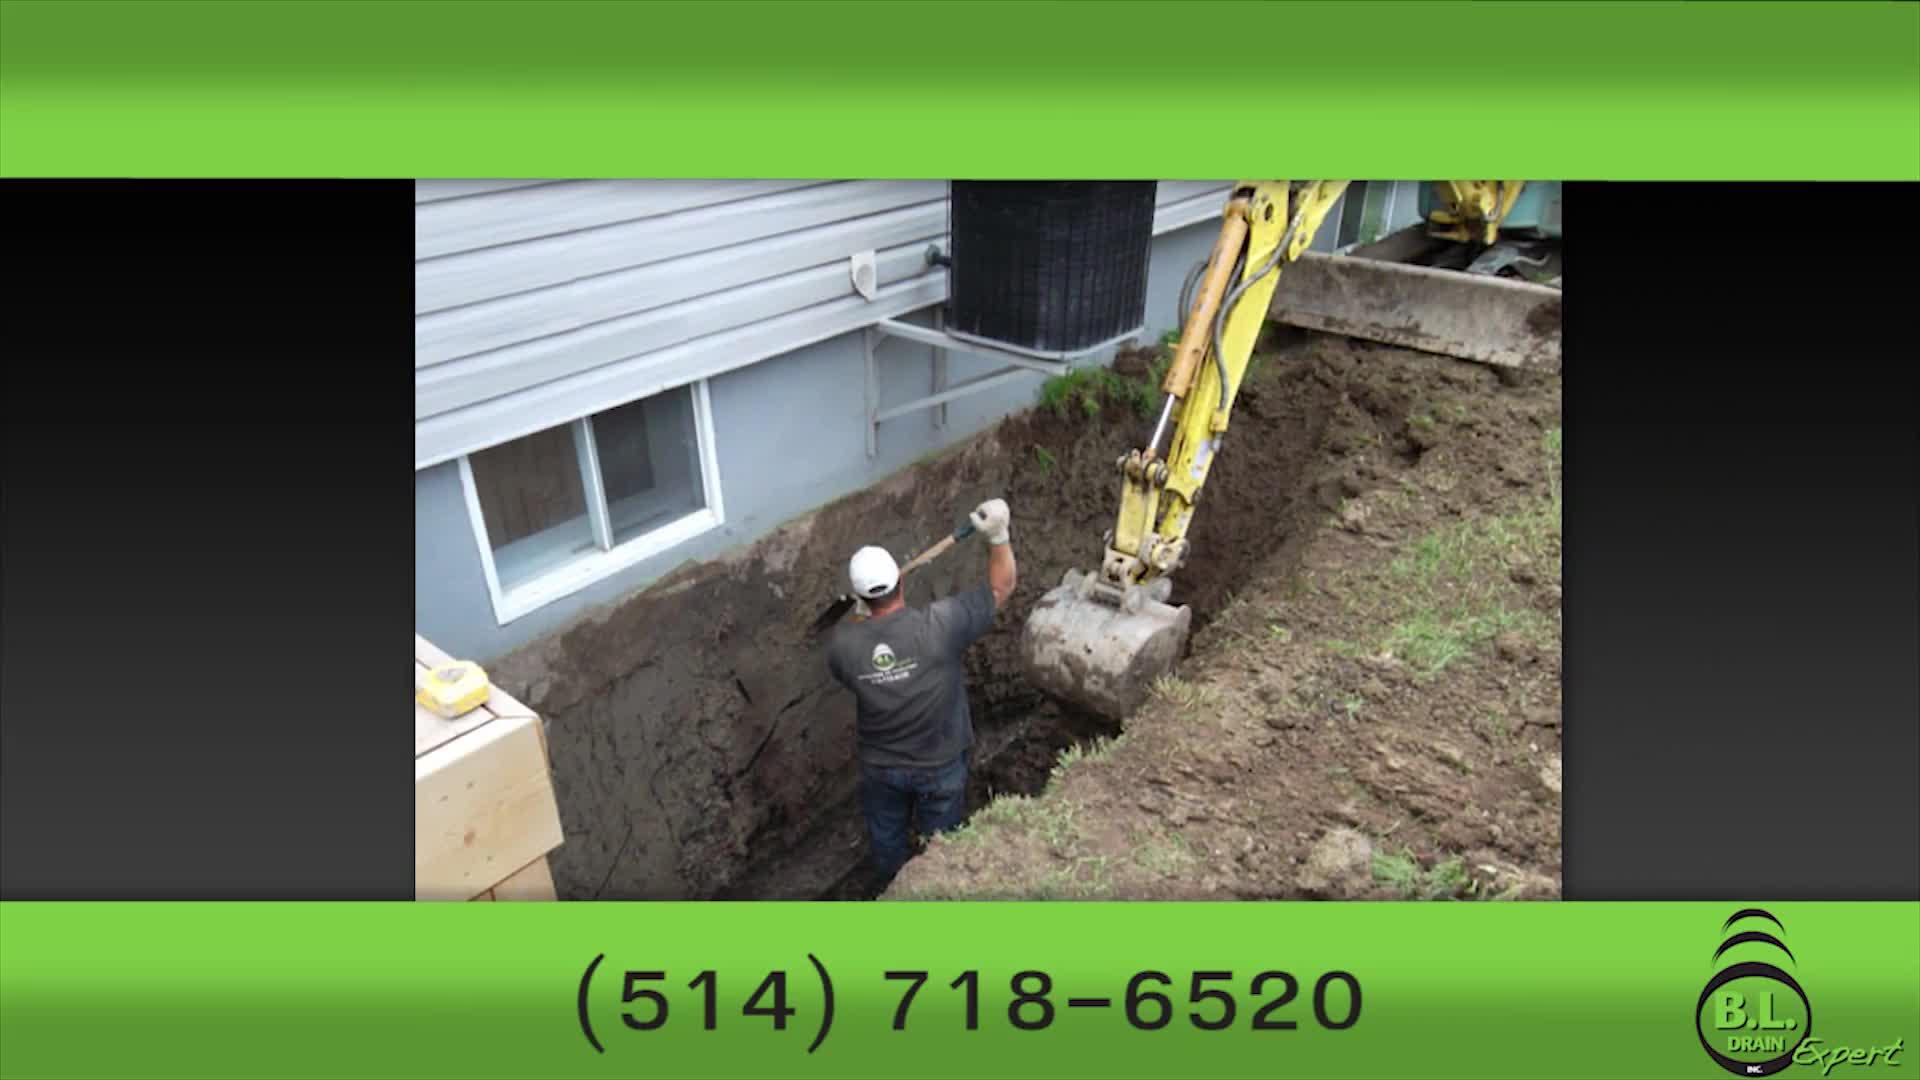 BL Drain Expert Inc - Entrepreneurs en drainage - 514-718-6520